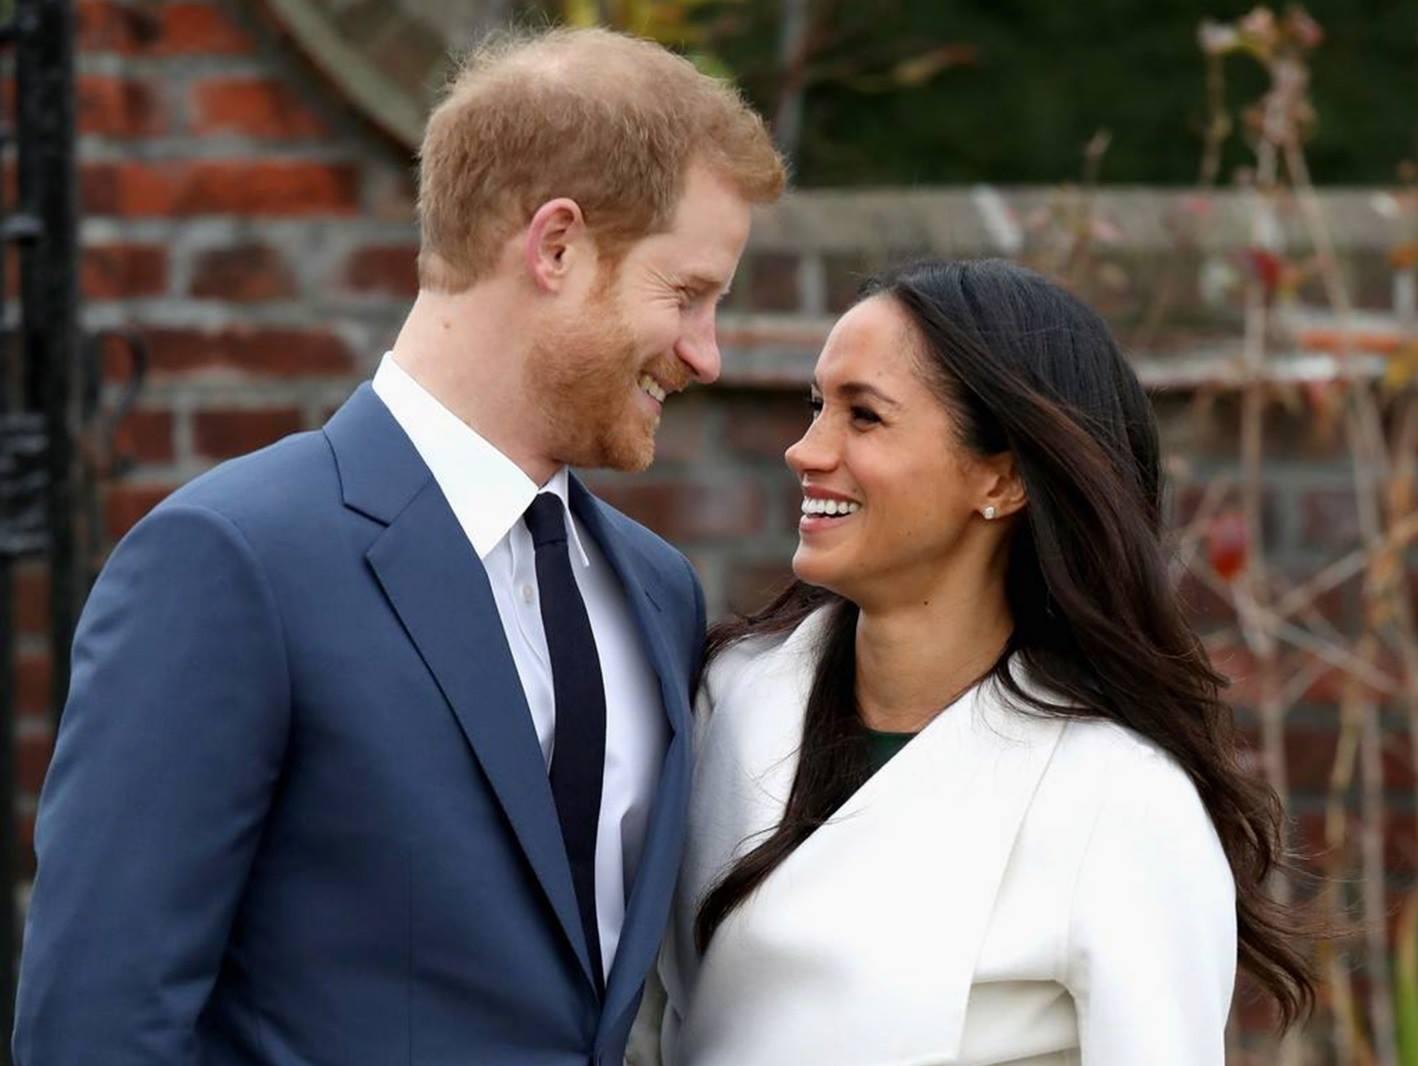 Принц Гарри и Меган Маркл на приеме в резиденции британского посла в Кейптауне